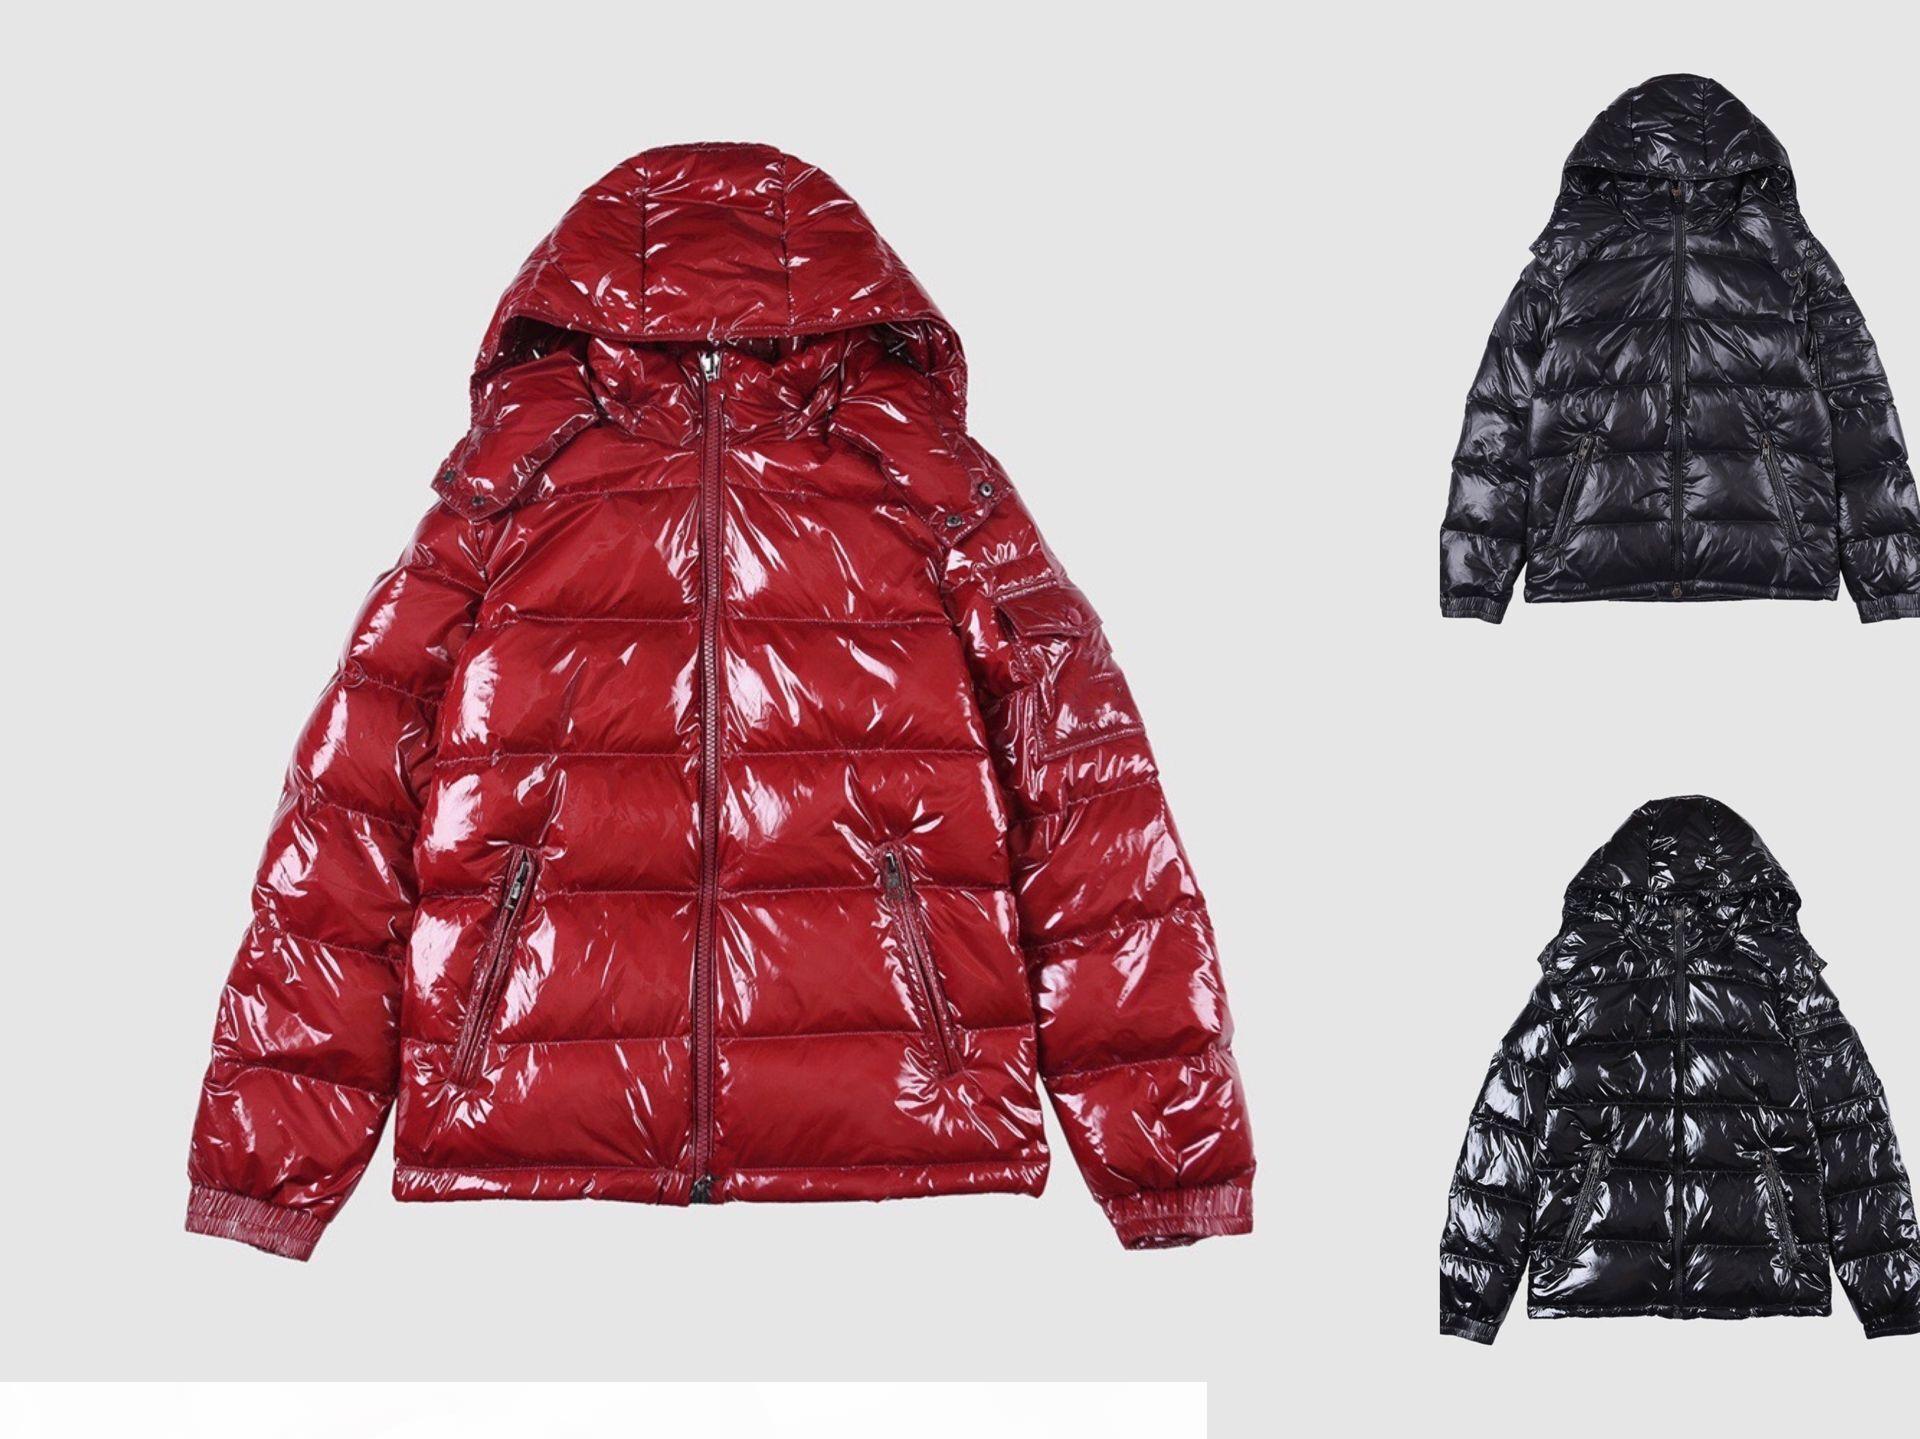 Wholesale jaqueta de inverno maya roupas ganso casaco quente casaco de inverno ao ar livre jaqueta de inverno parka clássico mens para baixo